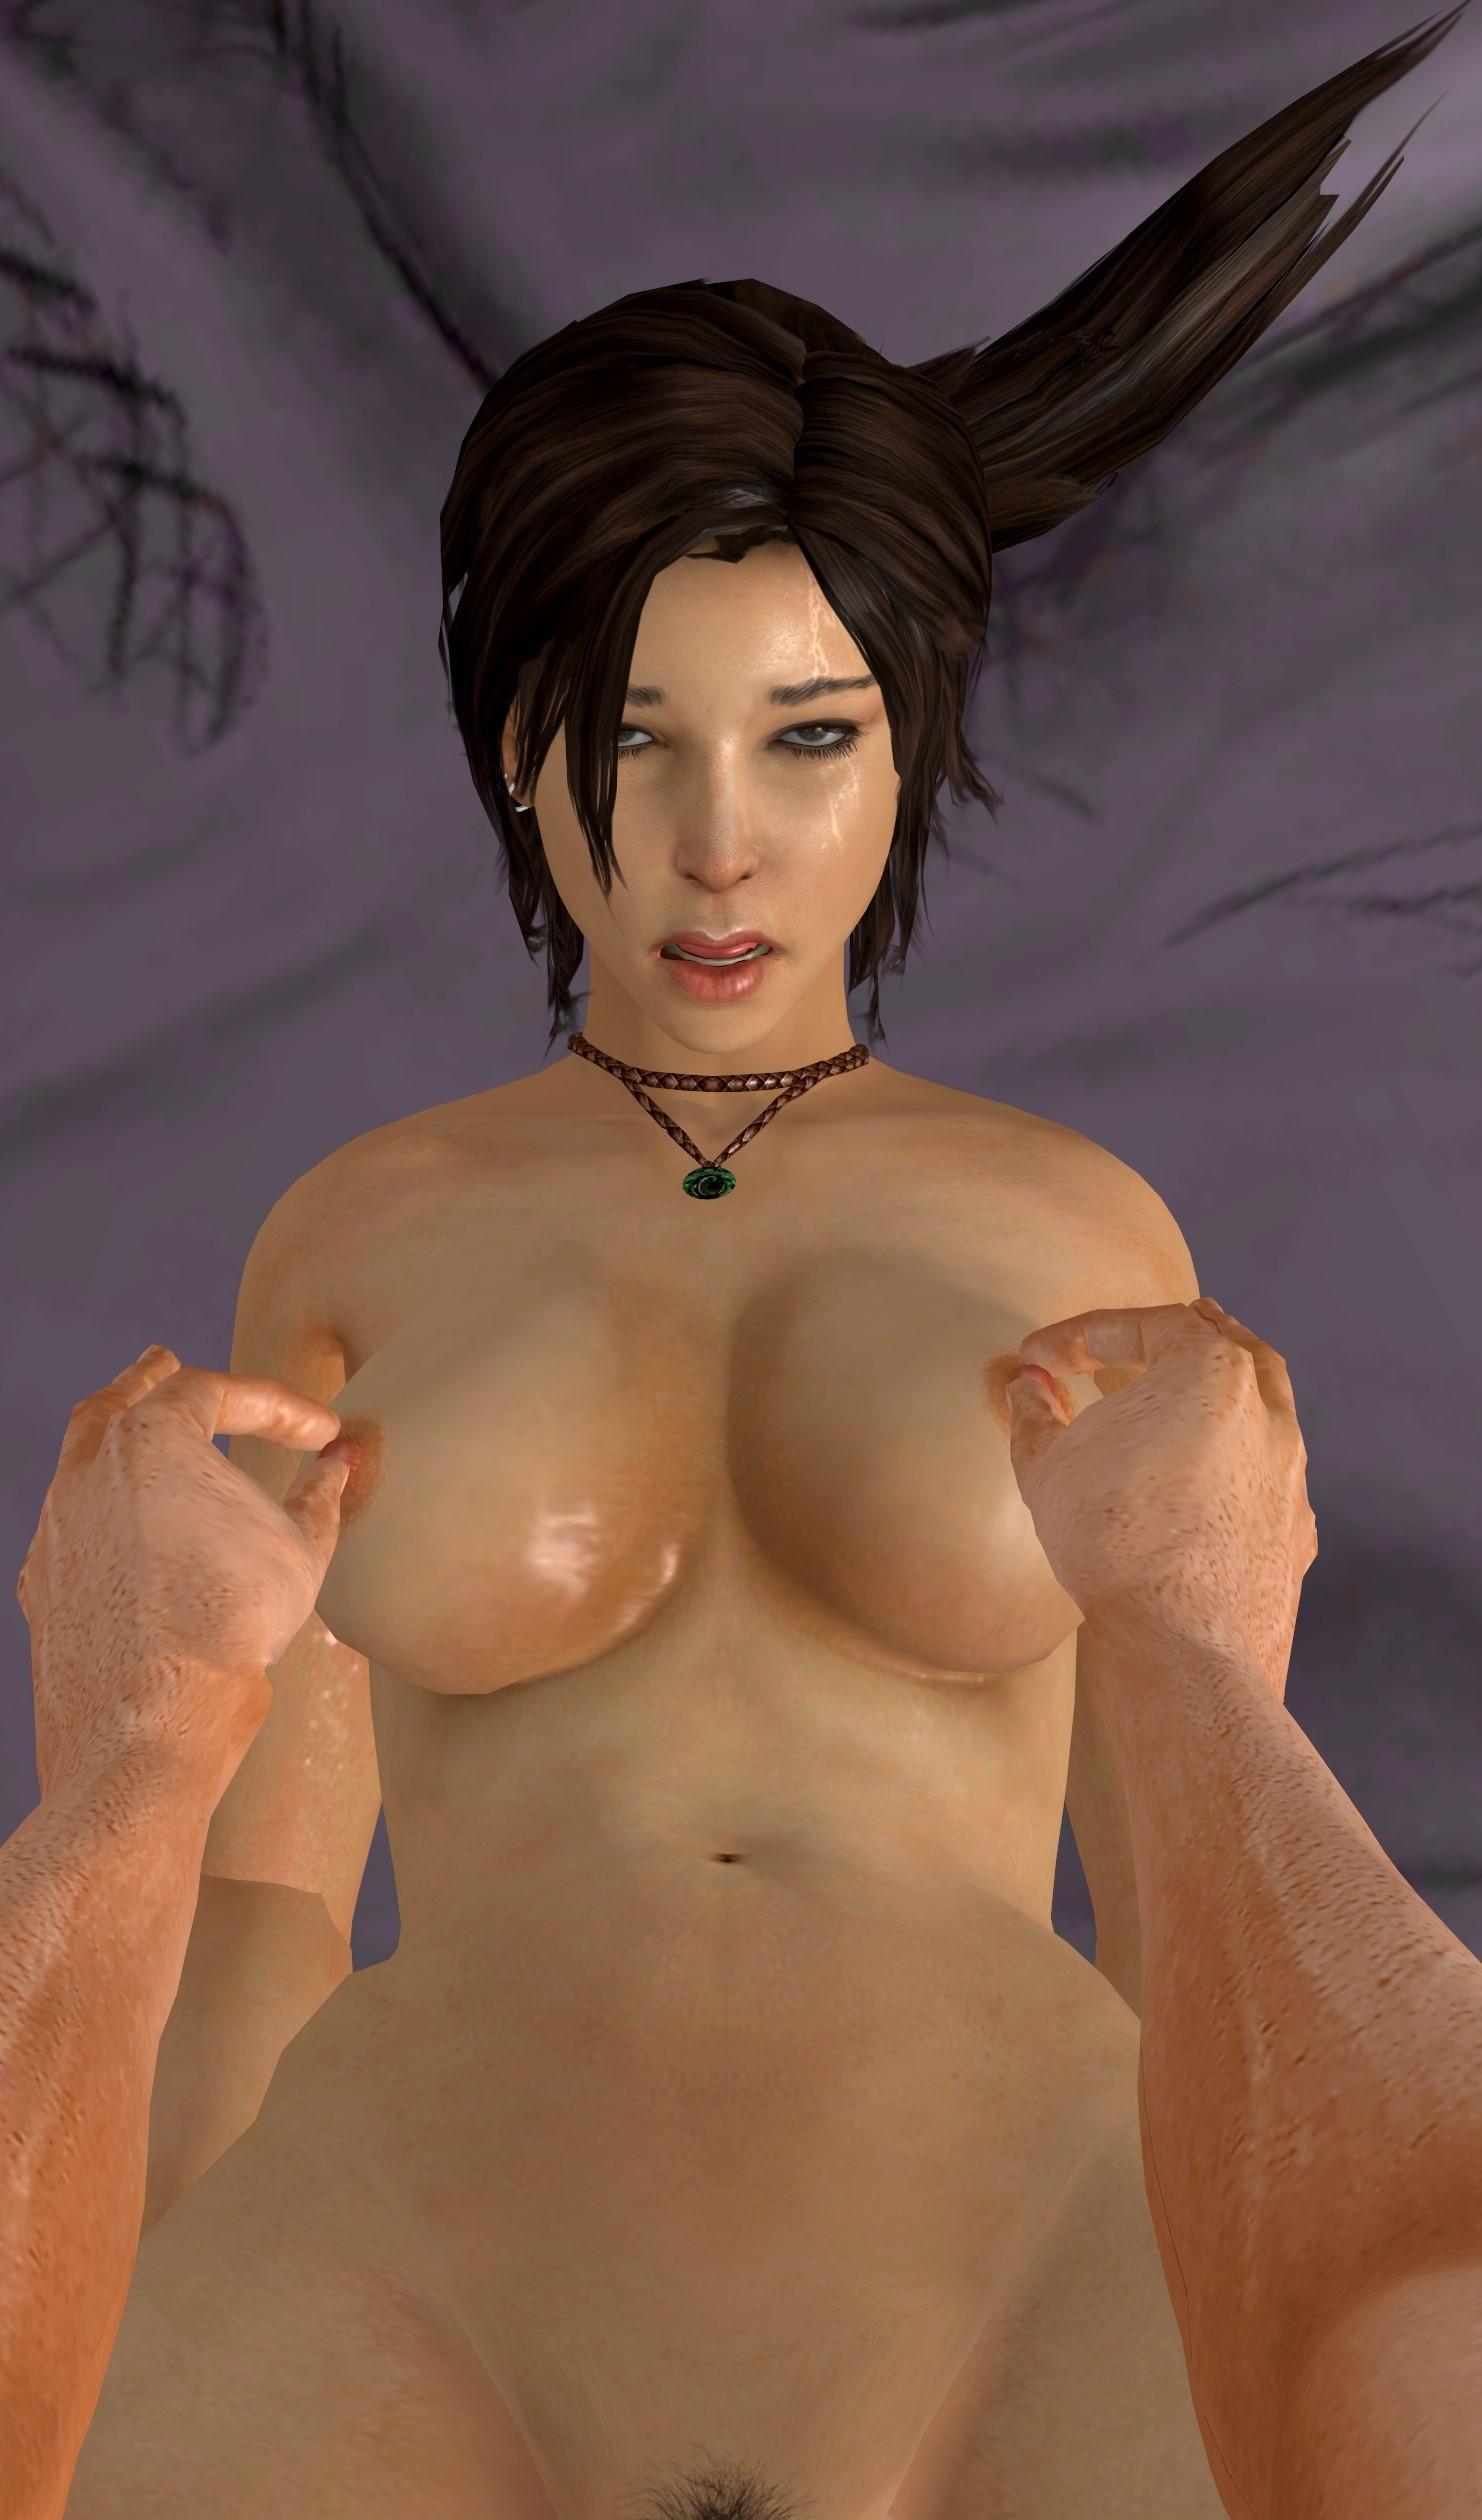 Lara croft 2013 porn hentai tube